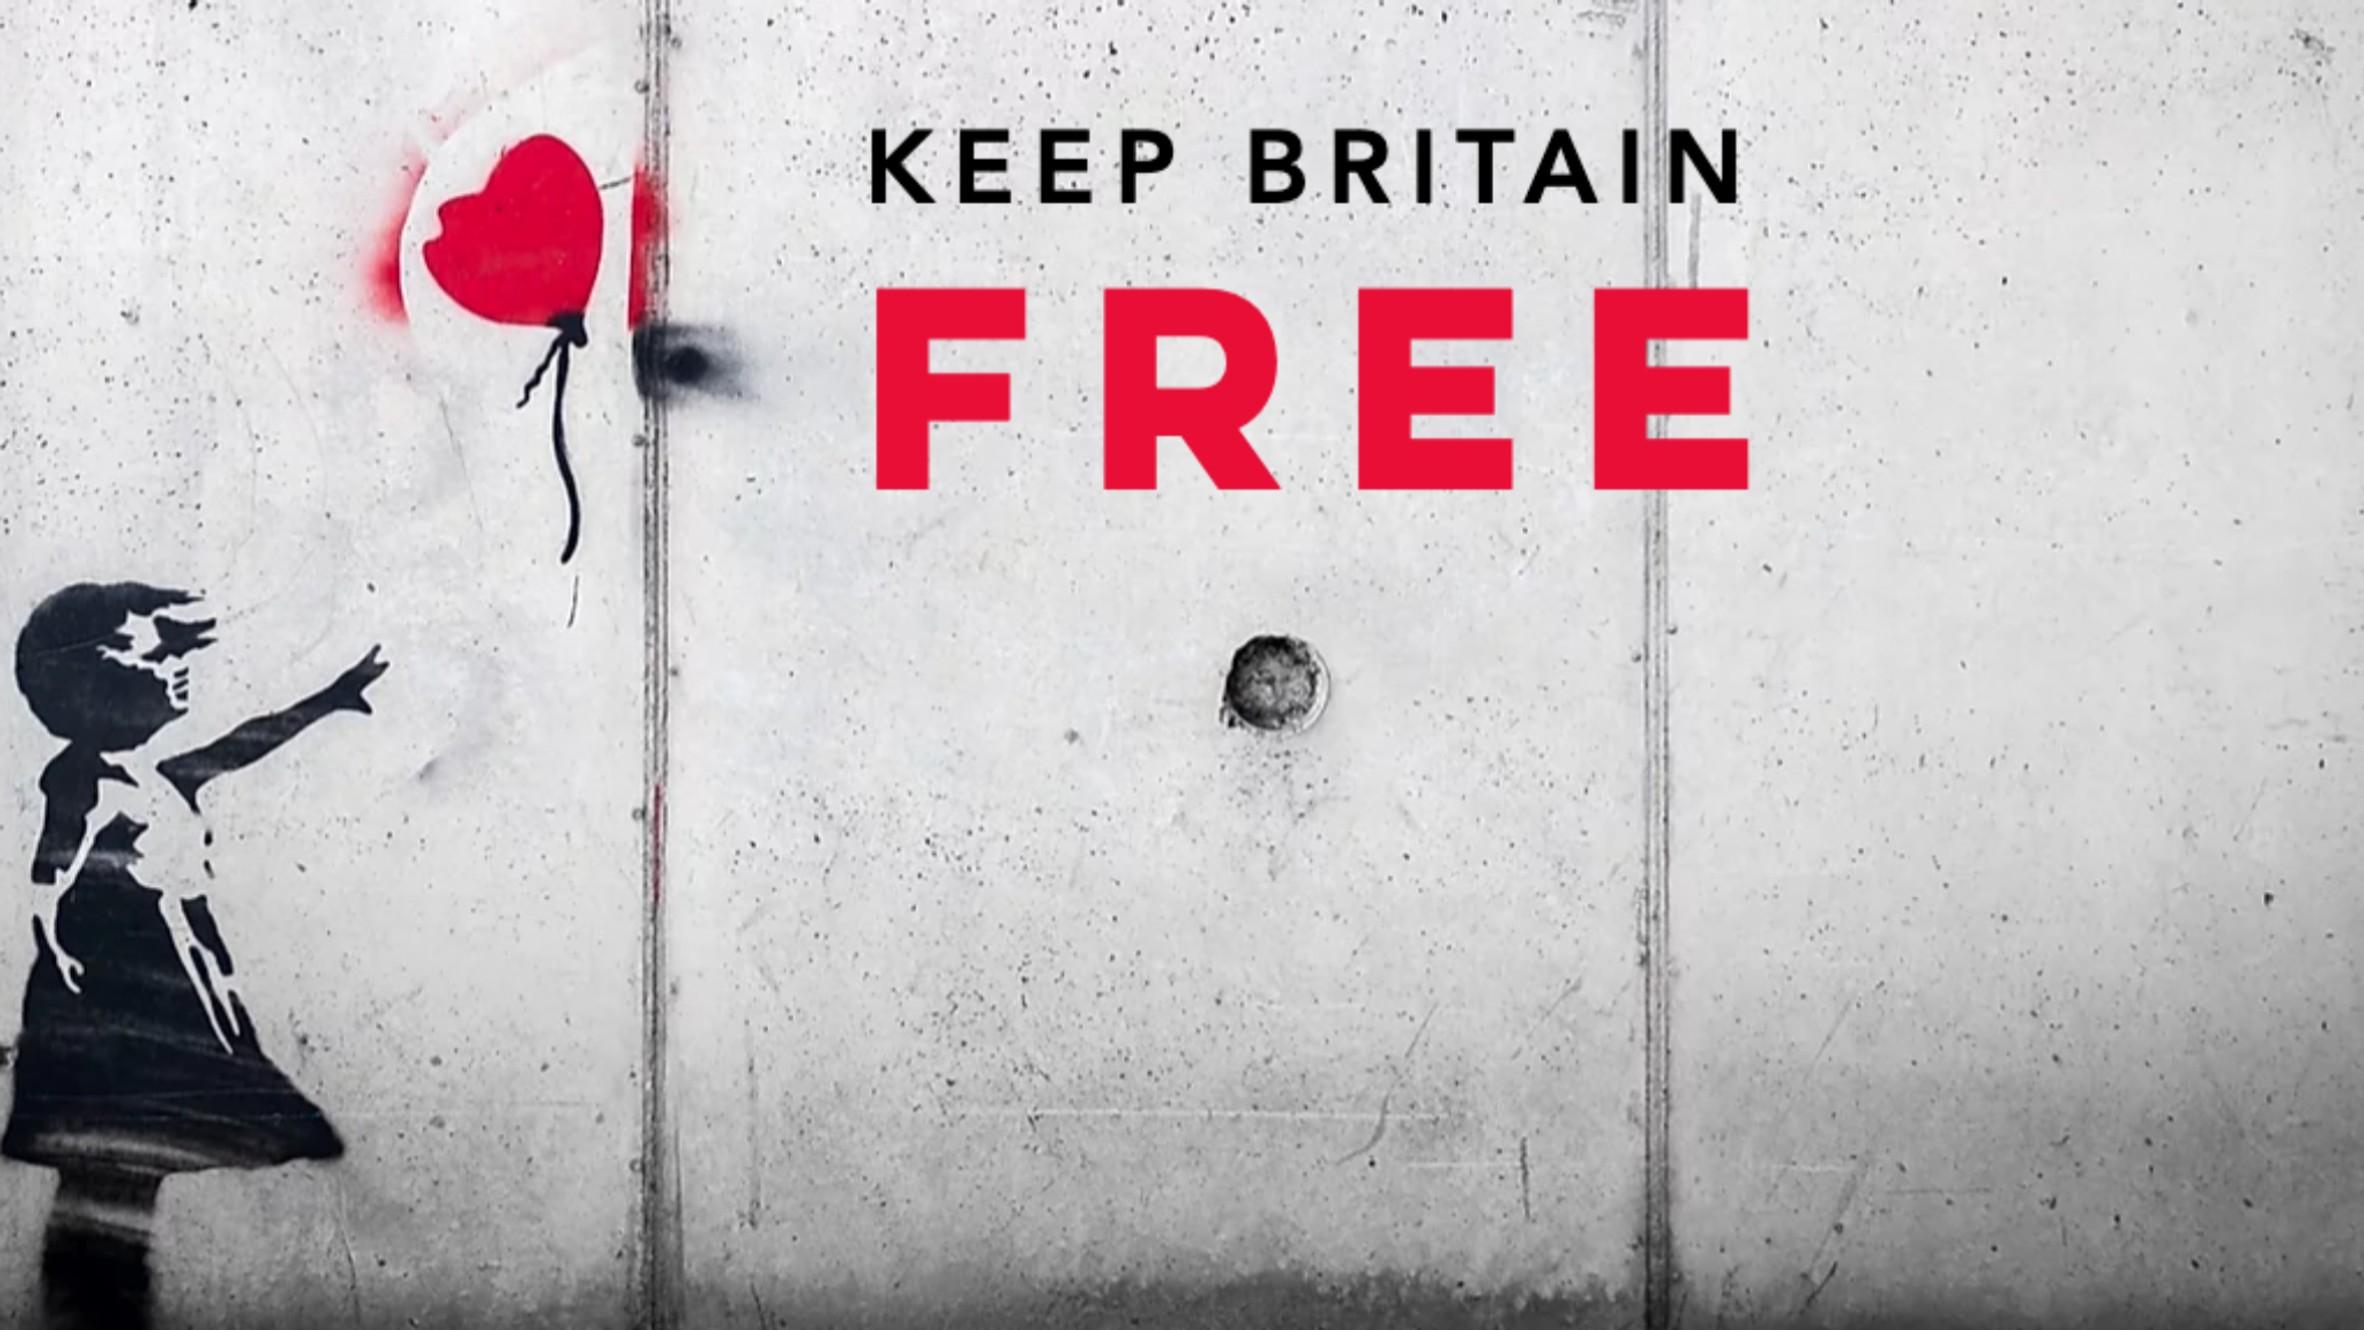 Keep Britain Free